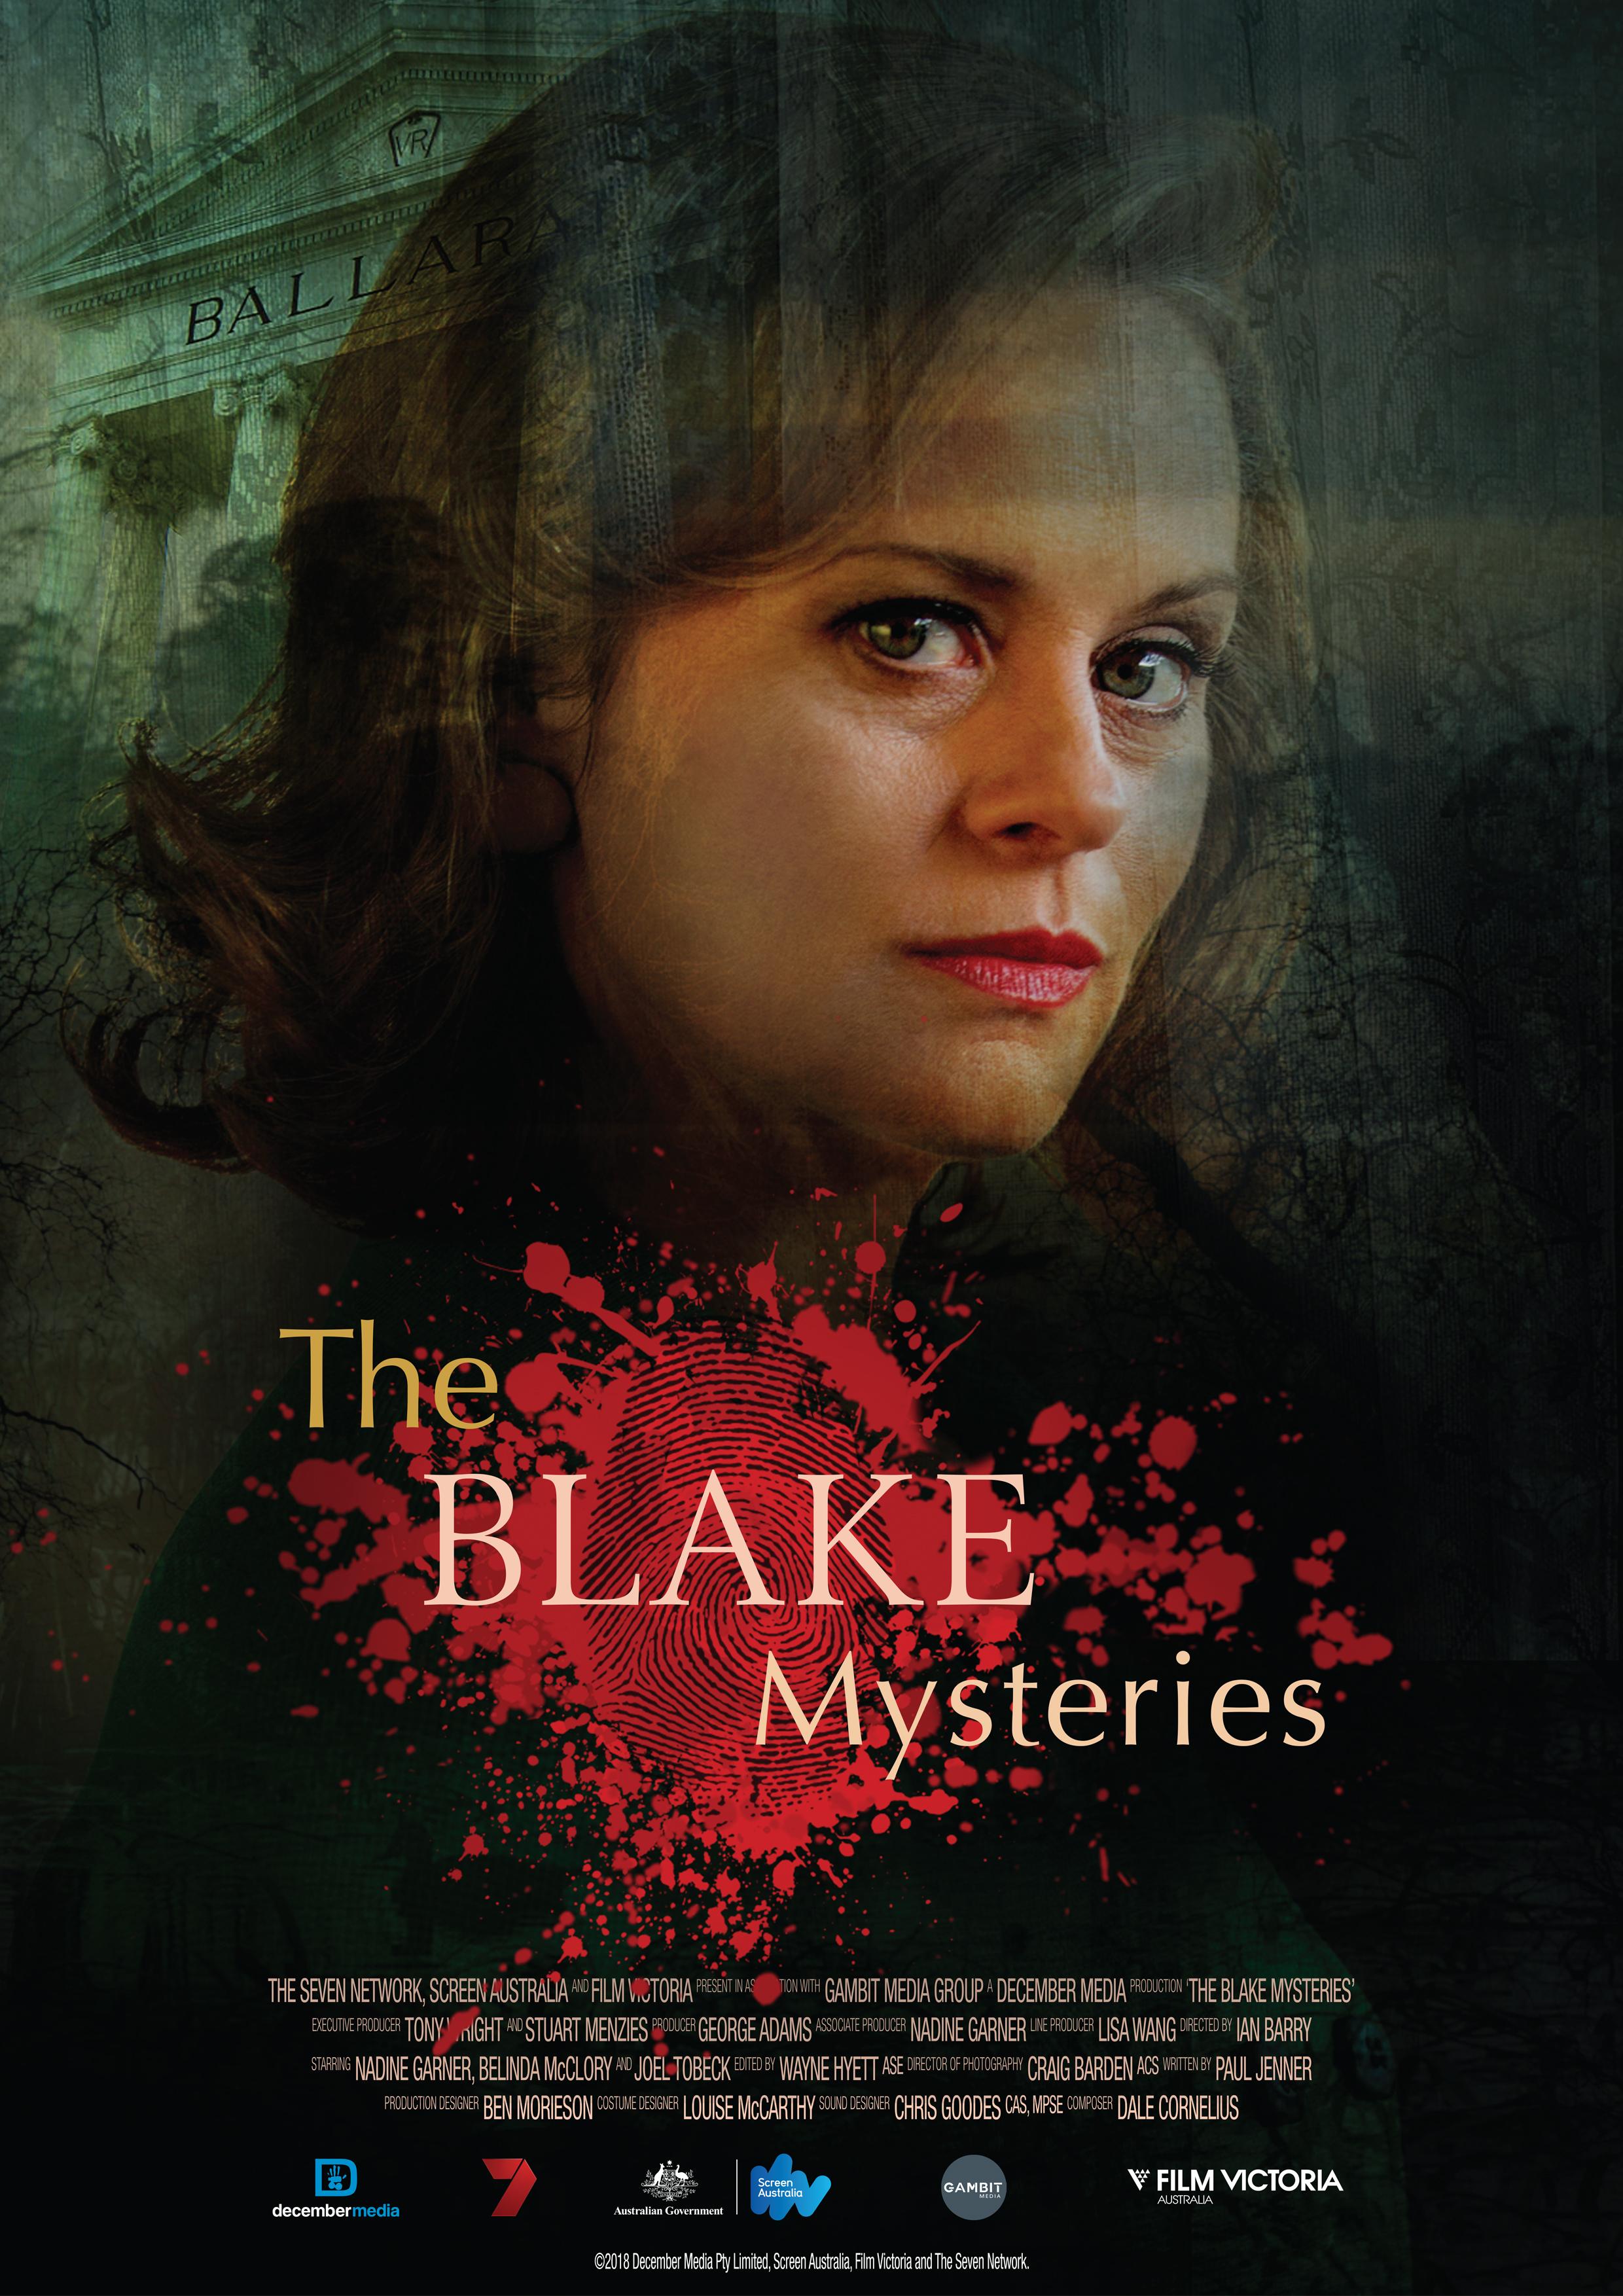 The Blake Mysteries: Ghost Stories (TV Movie 2018) - IMDb